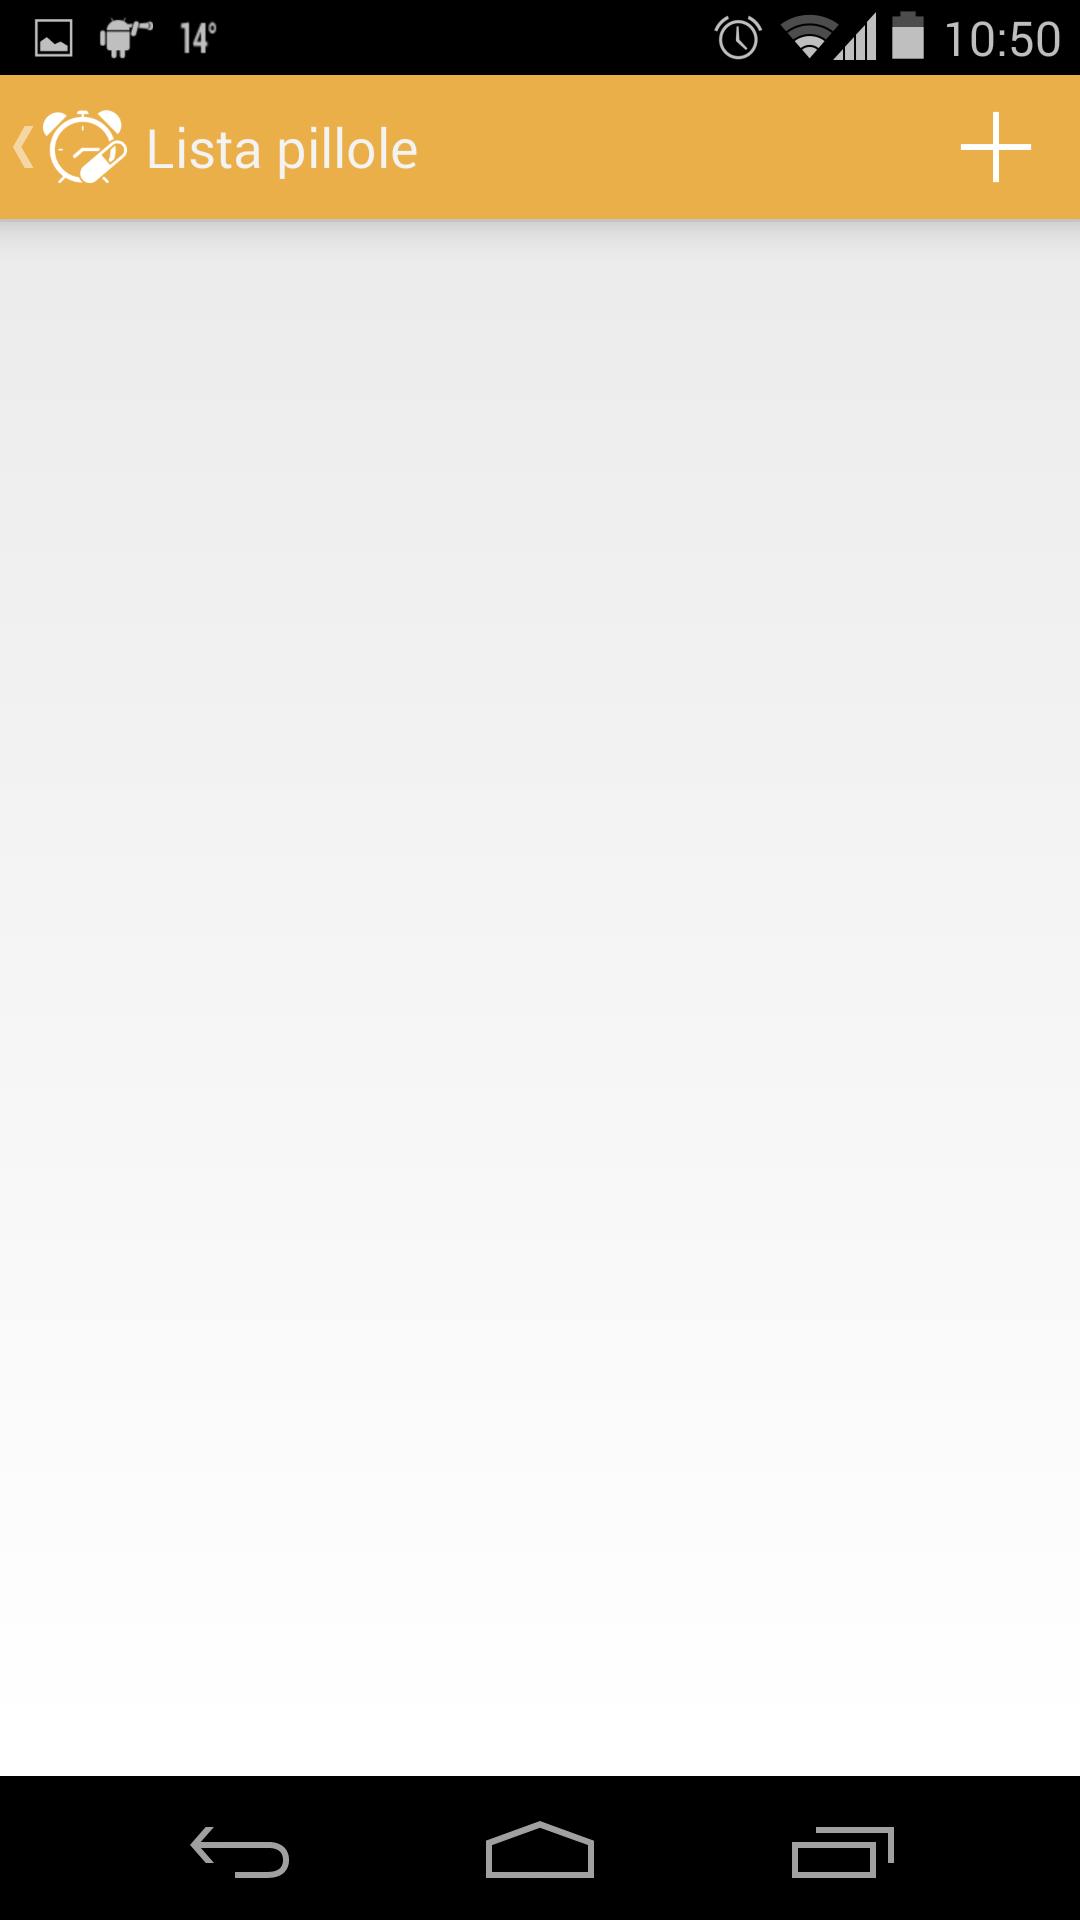 Screenshot_2013-11-23-10-50-48